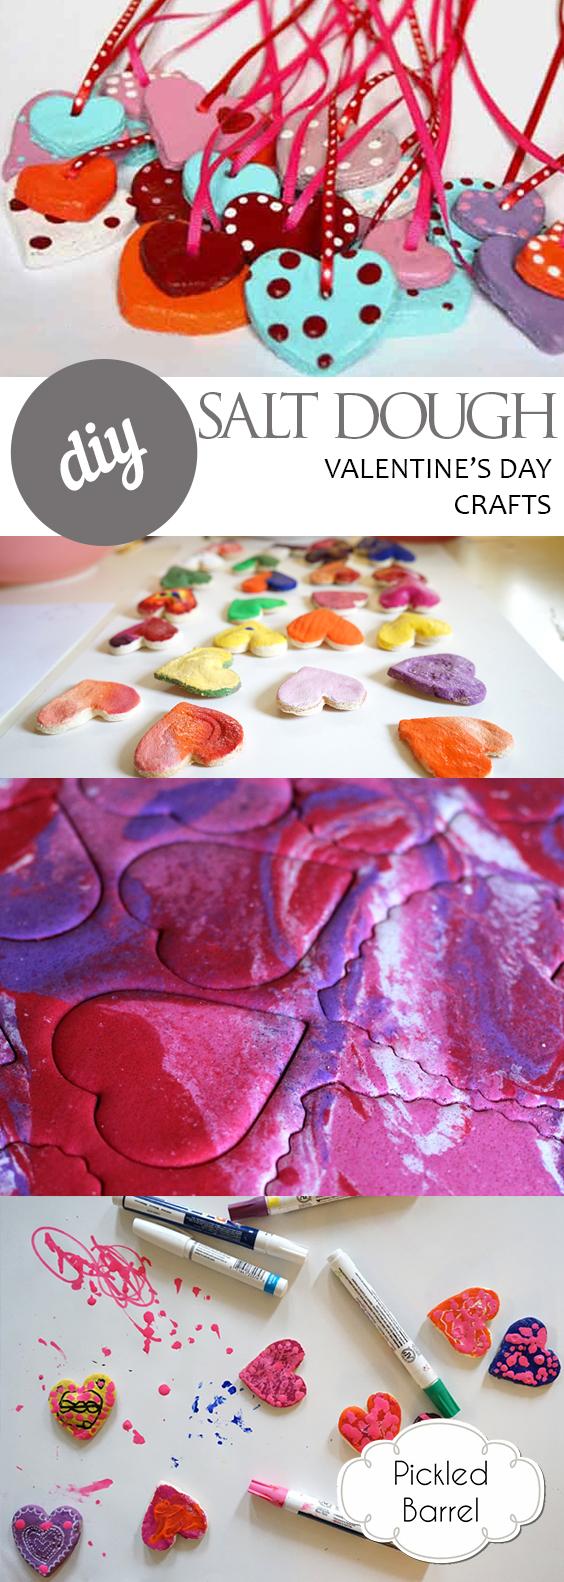 DIY Salt Dough Valentines Day Crafts| Valentines Day Crafts, Easy Crafts, Holiday Craft Ideas, Kids Crafts, Kid Stuff, Popular Pin #HolidayCrafts #KidStuff